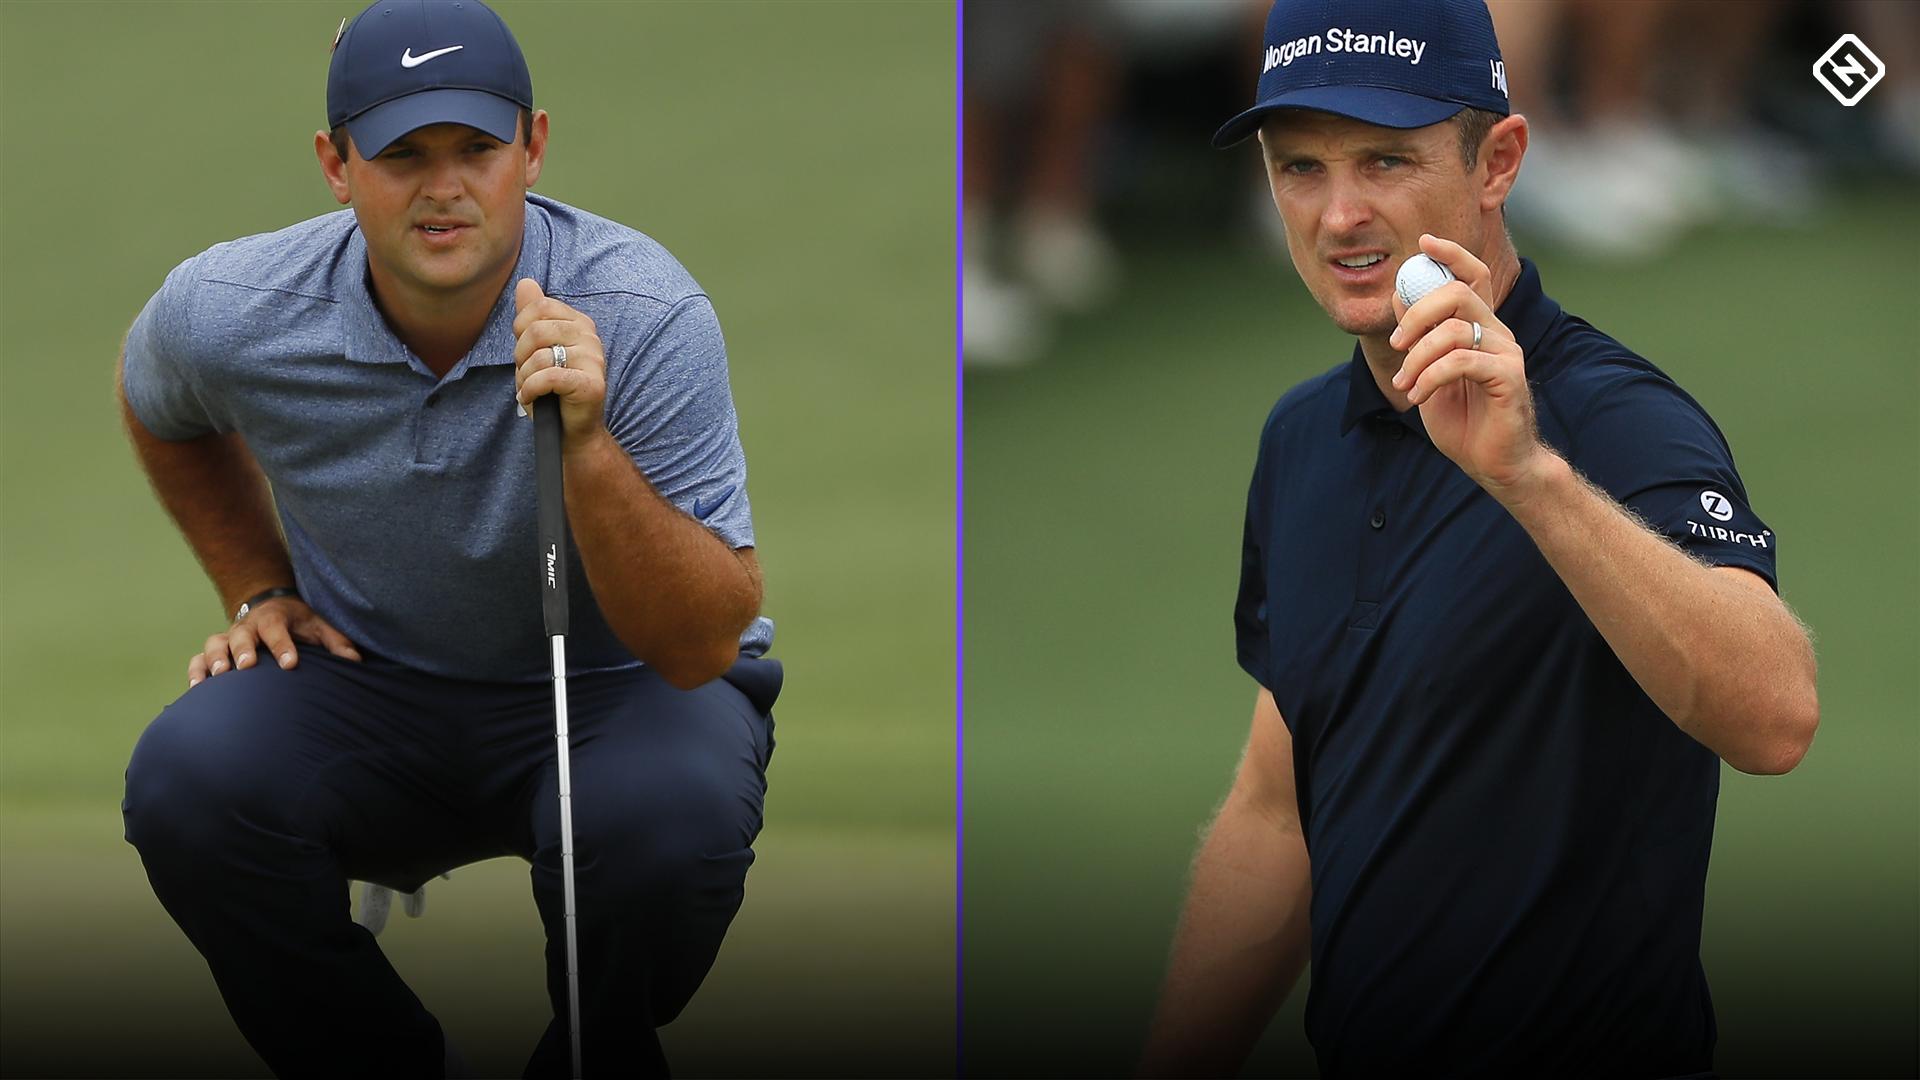 Wells Fargo Championship PGA DFS picks, sleepers, fades, strategy